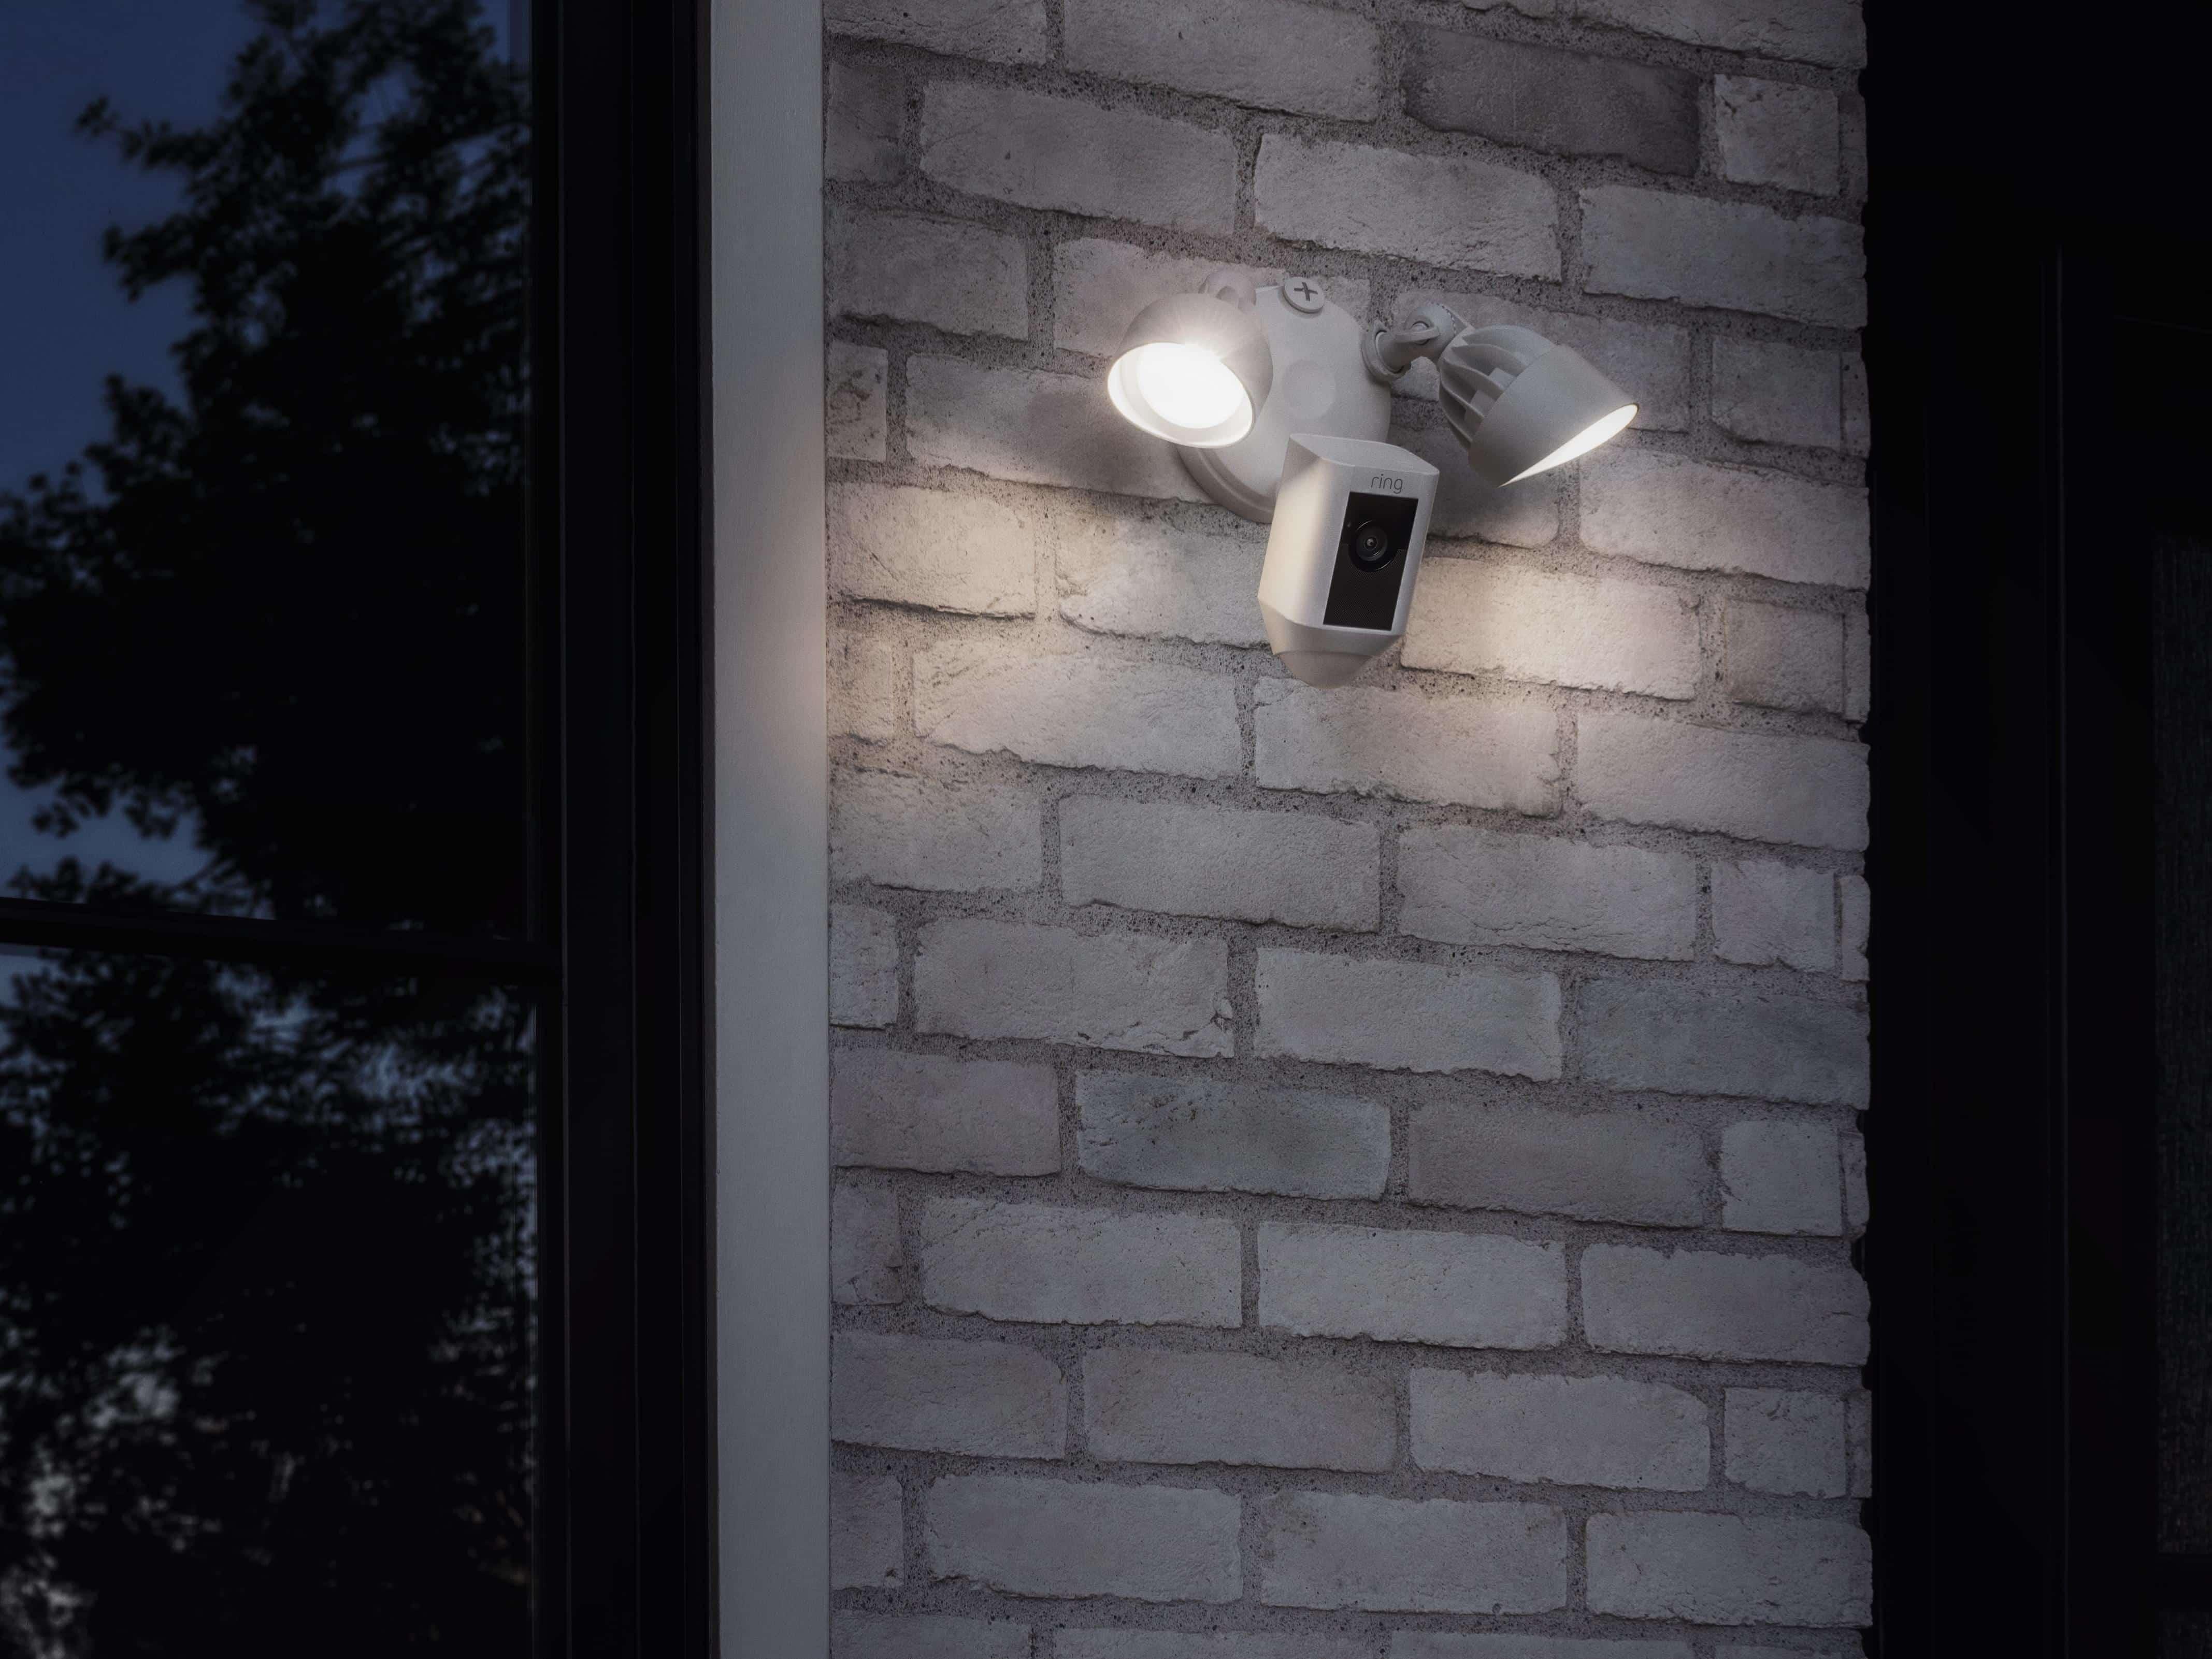 Ring Floodlight Cam 7